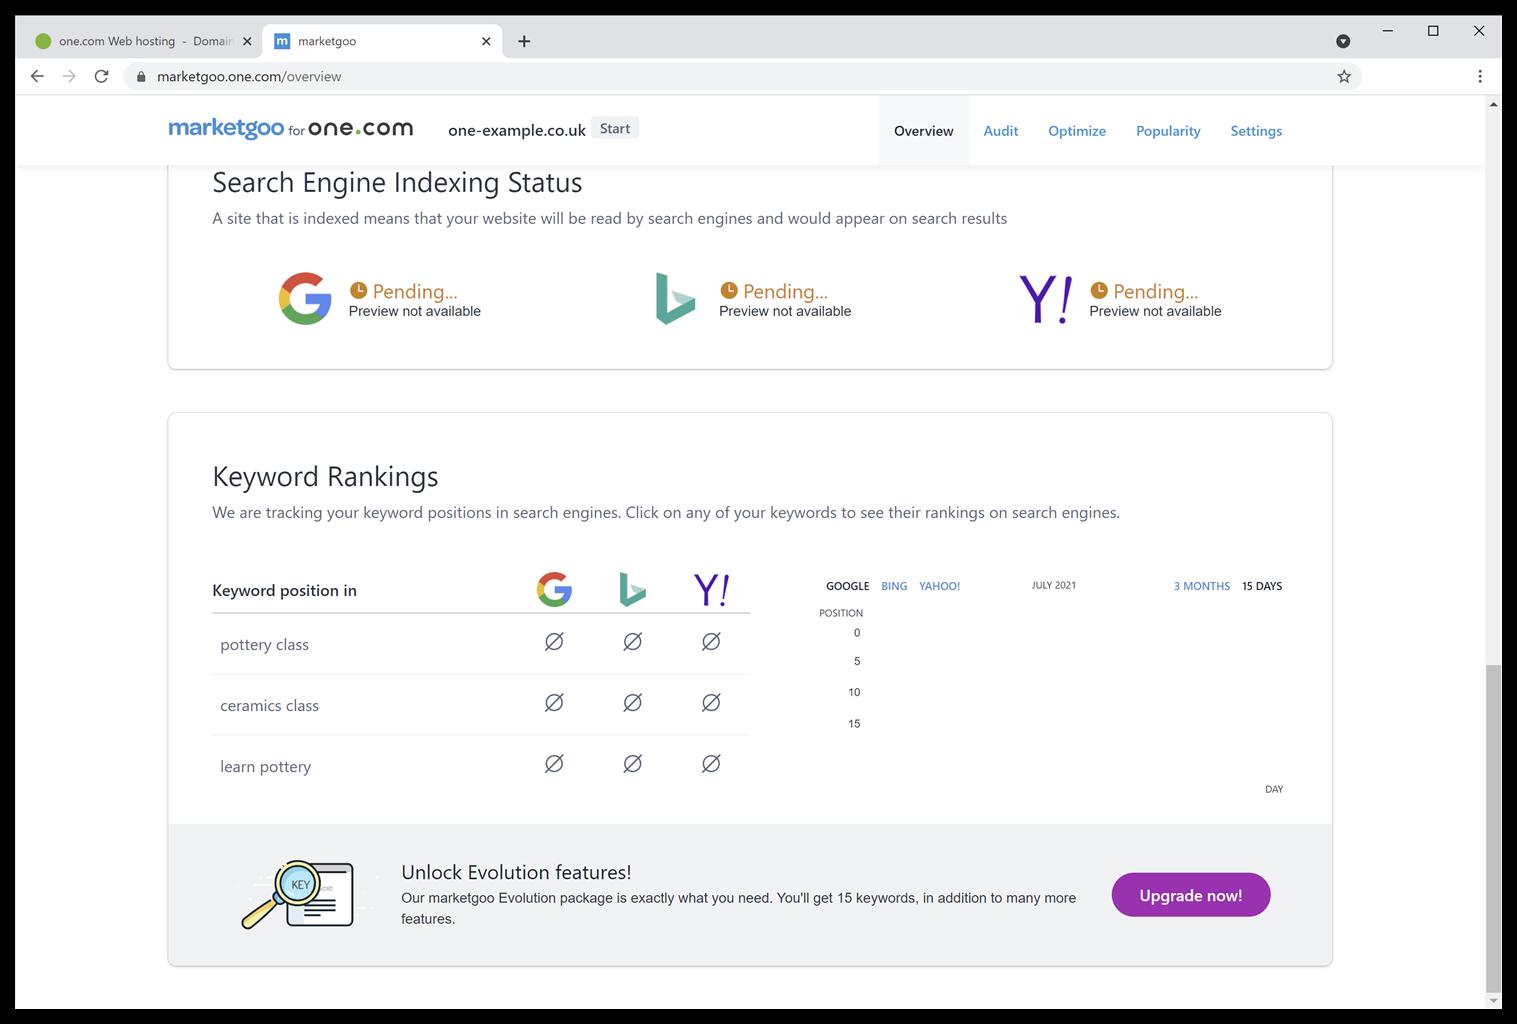 marketgoo-keyword-rankings.png